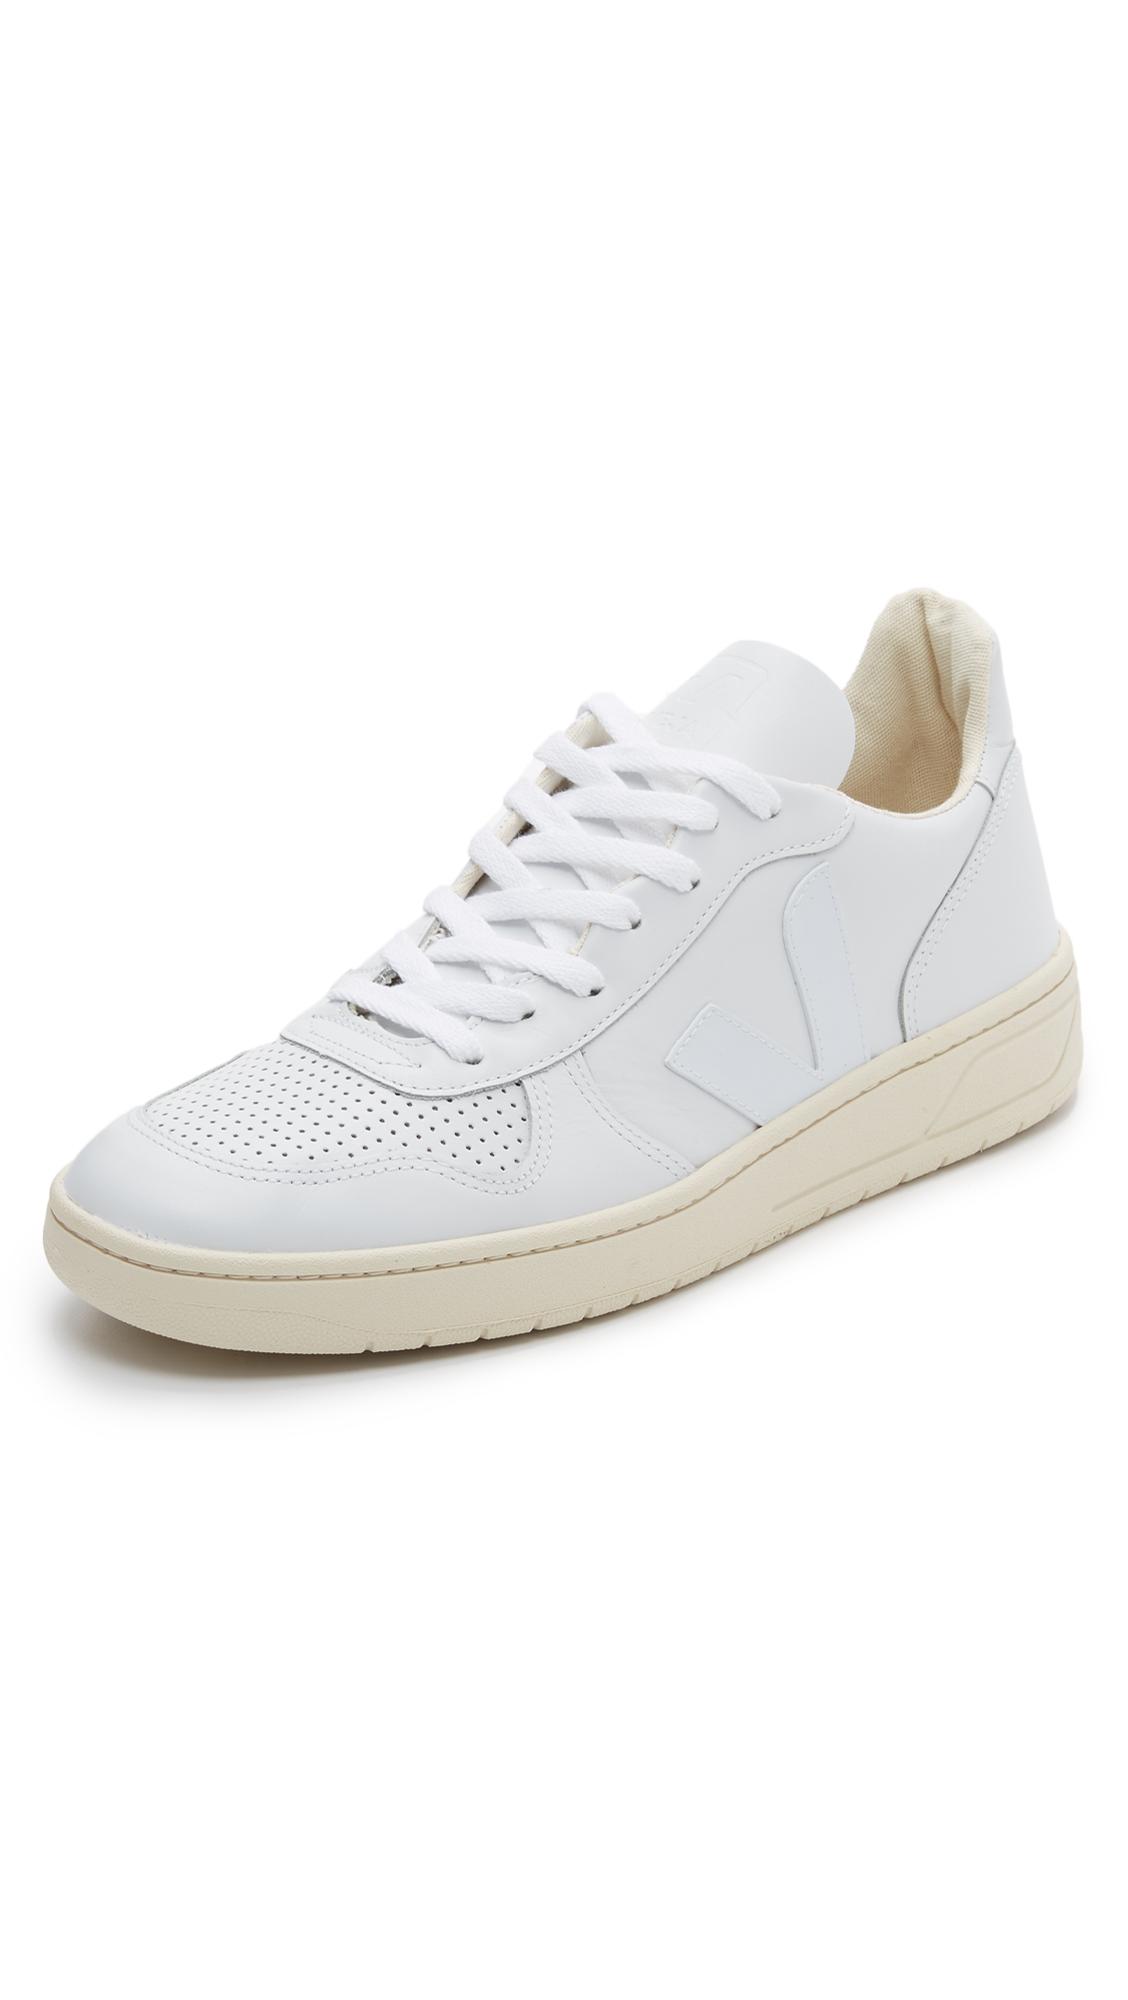 VEJA V-10 Rubber-Trimmed Leather Sneakers - White